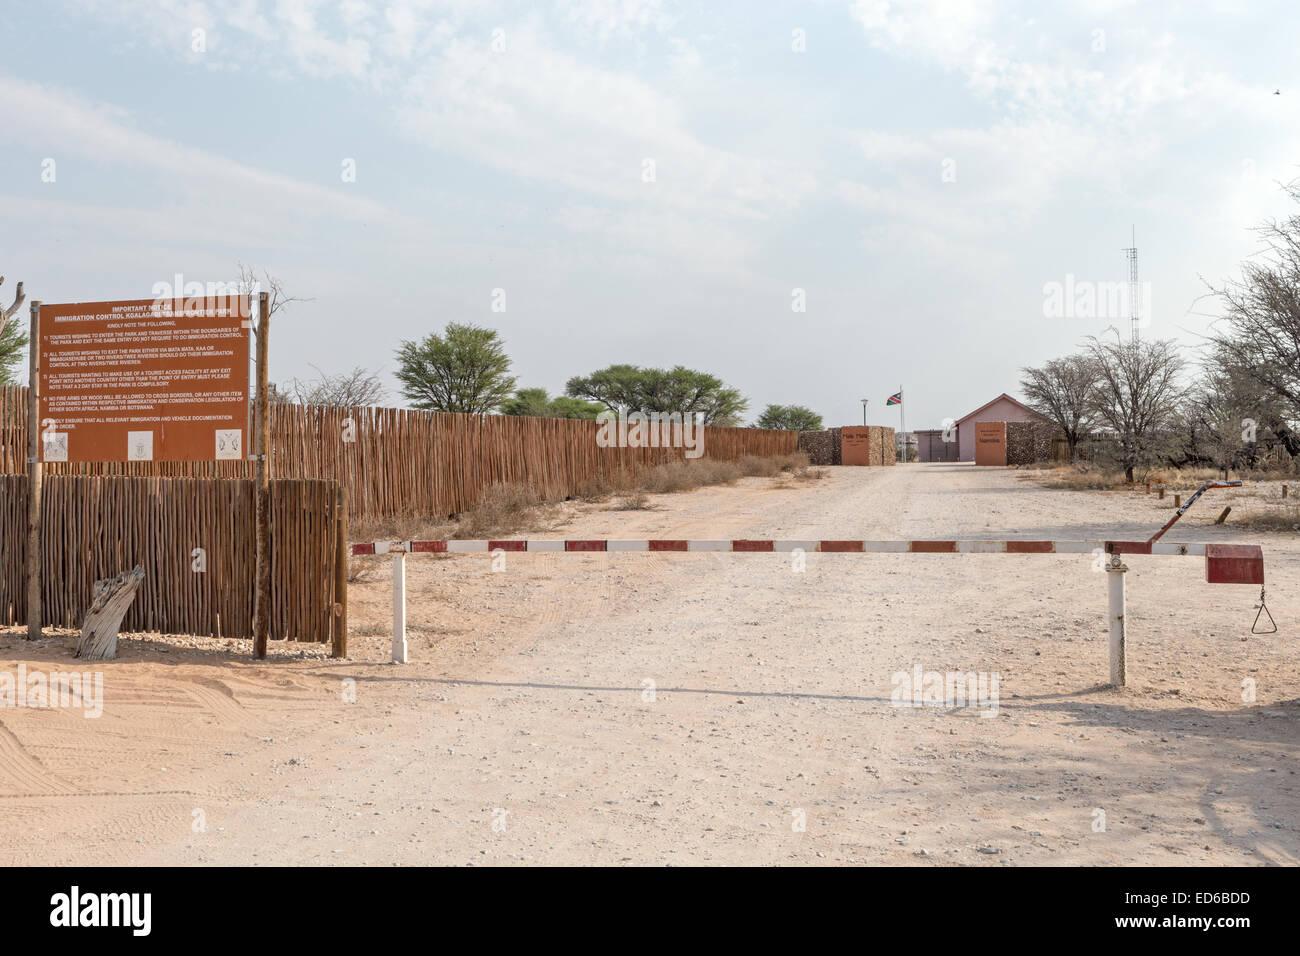 South African Namibian border Mata-Mata Kgalagadi Transfrontier Park South Africa spring outdoor sunny barrier immigration - Stock Image